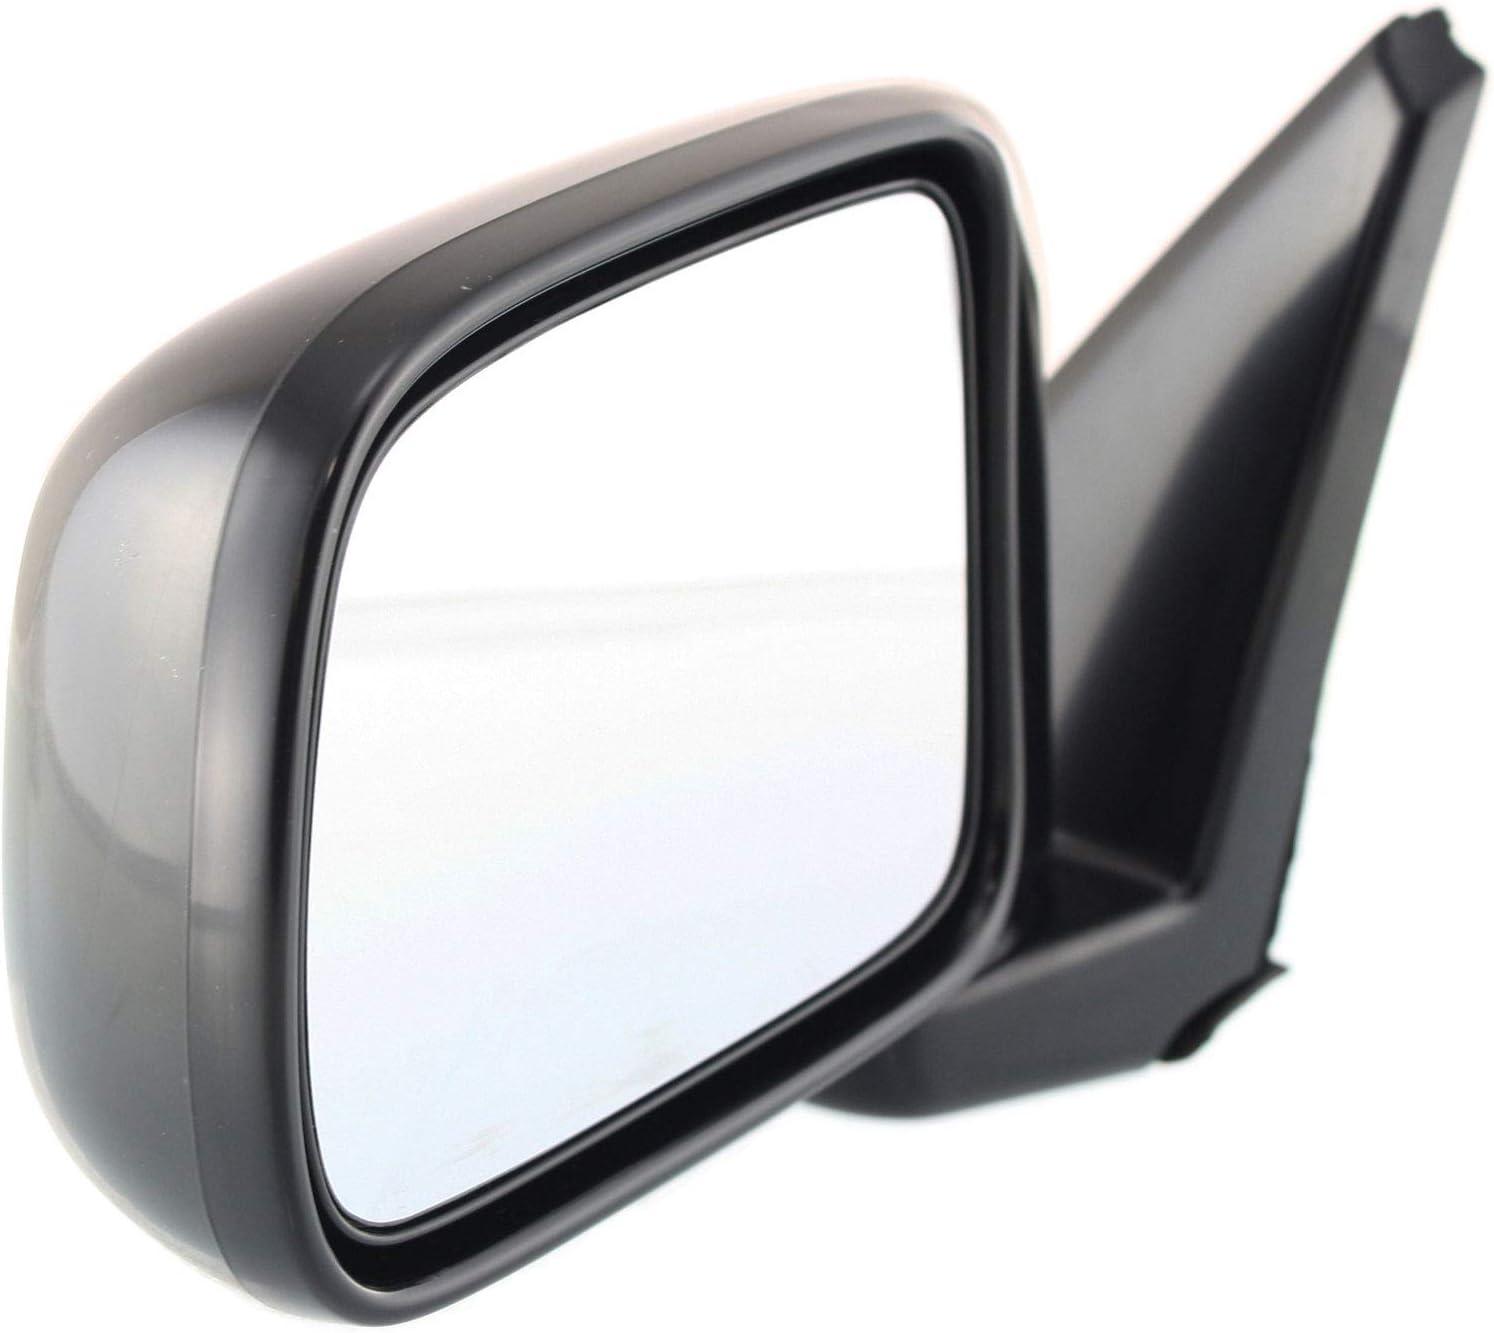 76250S10A01 HO1320115 Mirror Left Hand Side Driver LH for Honda CR-V 1997-2001